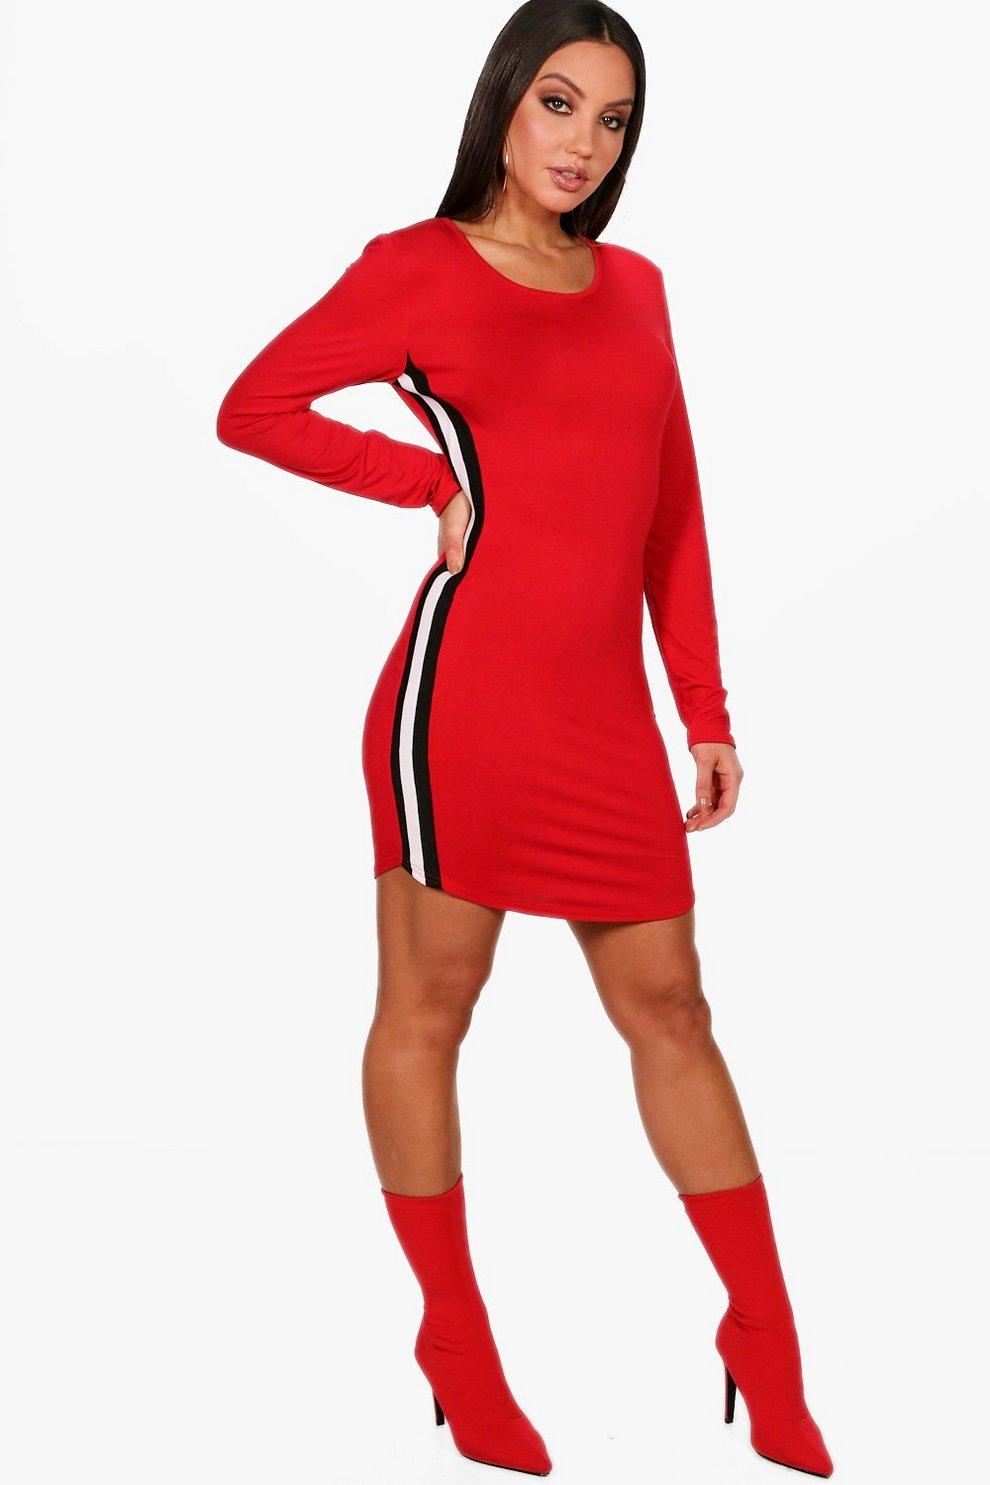 611368a436350 Womens Red Sports Stripe Bodycon Dress